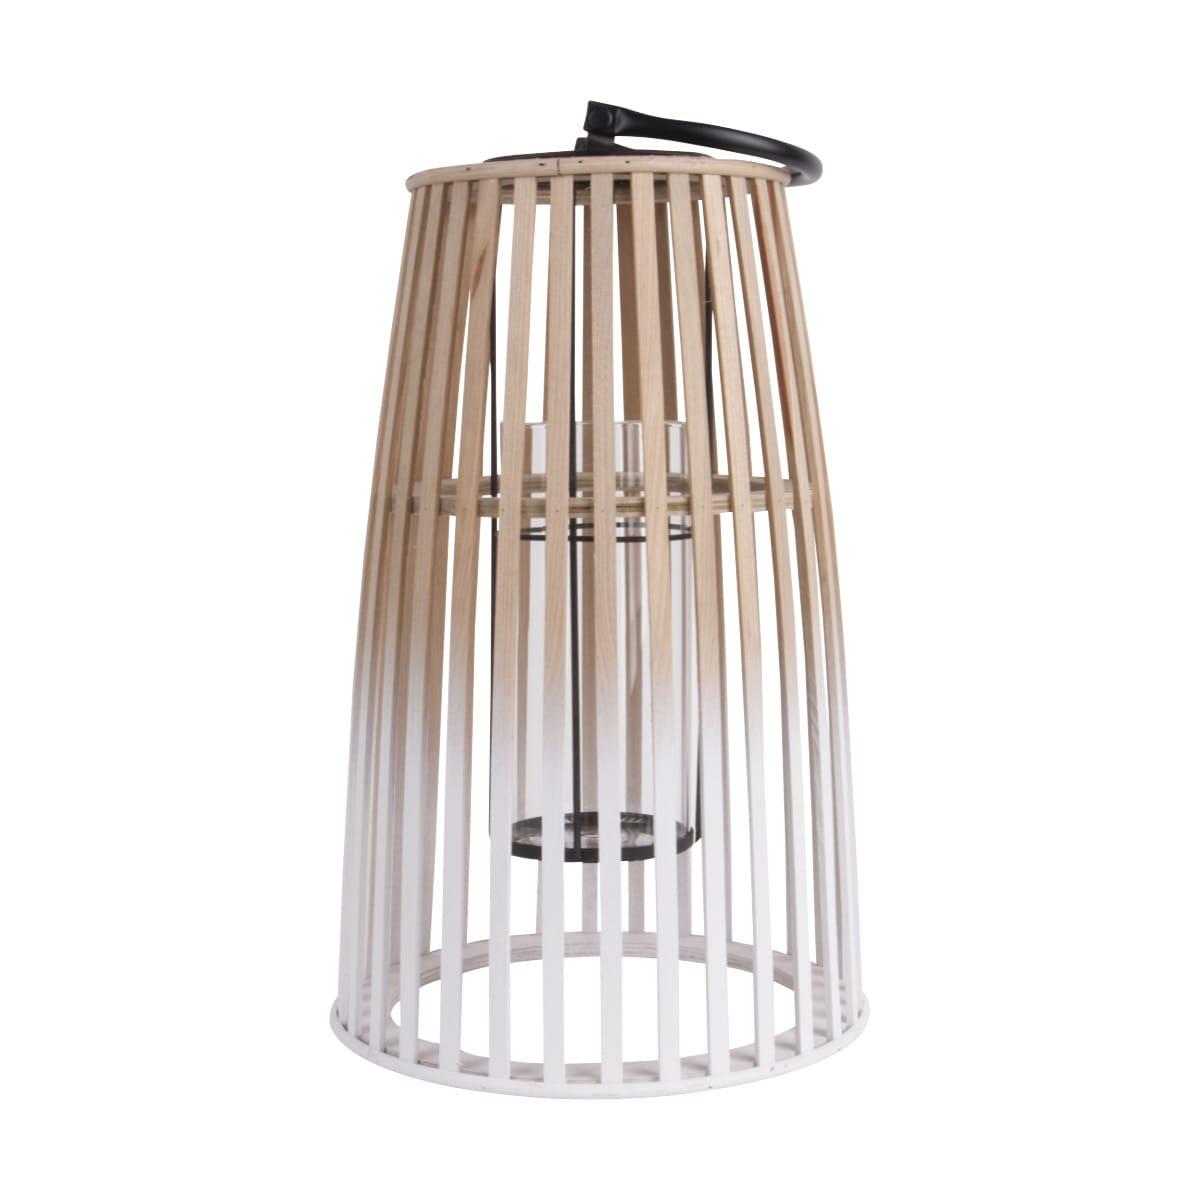 Sada 2 ks: Bambusová lucerna Atmosphere - velká